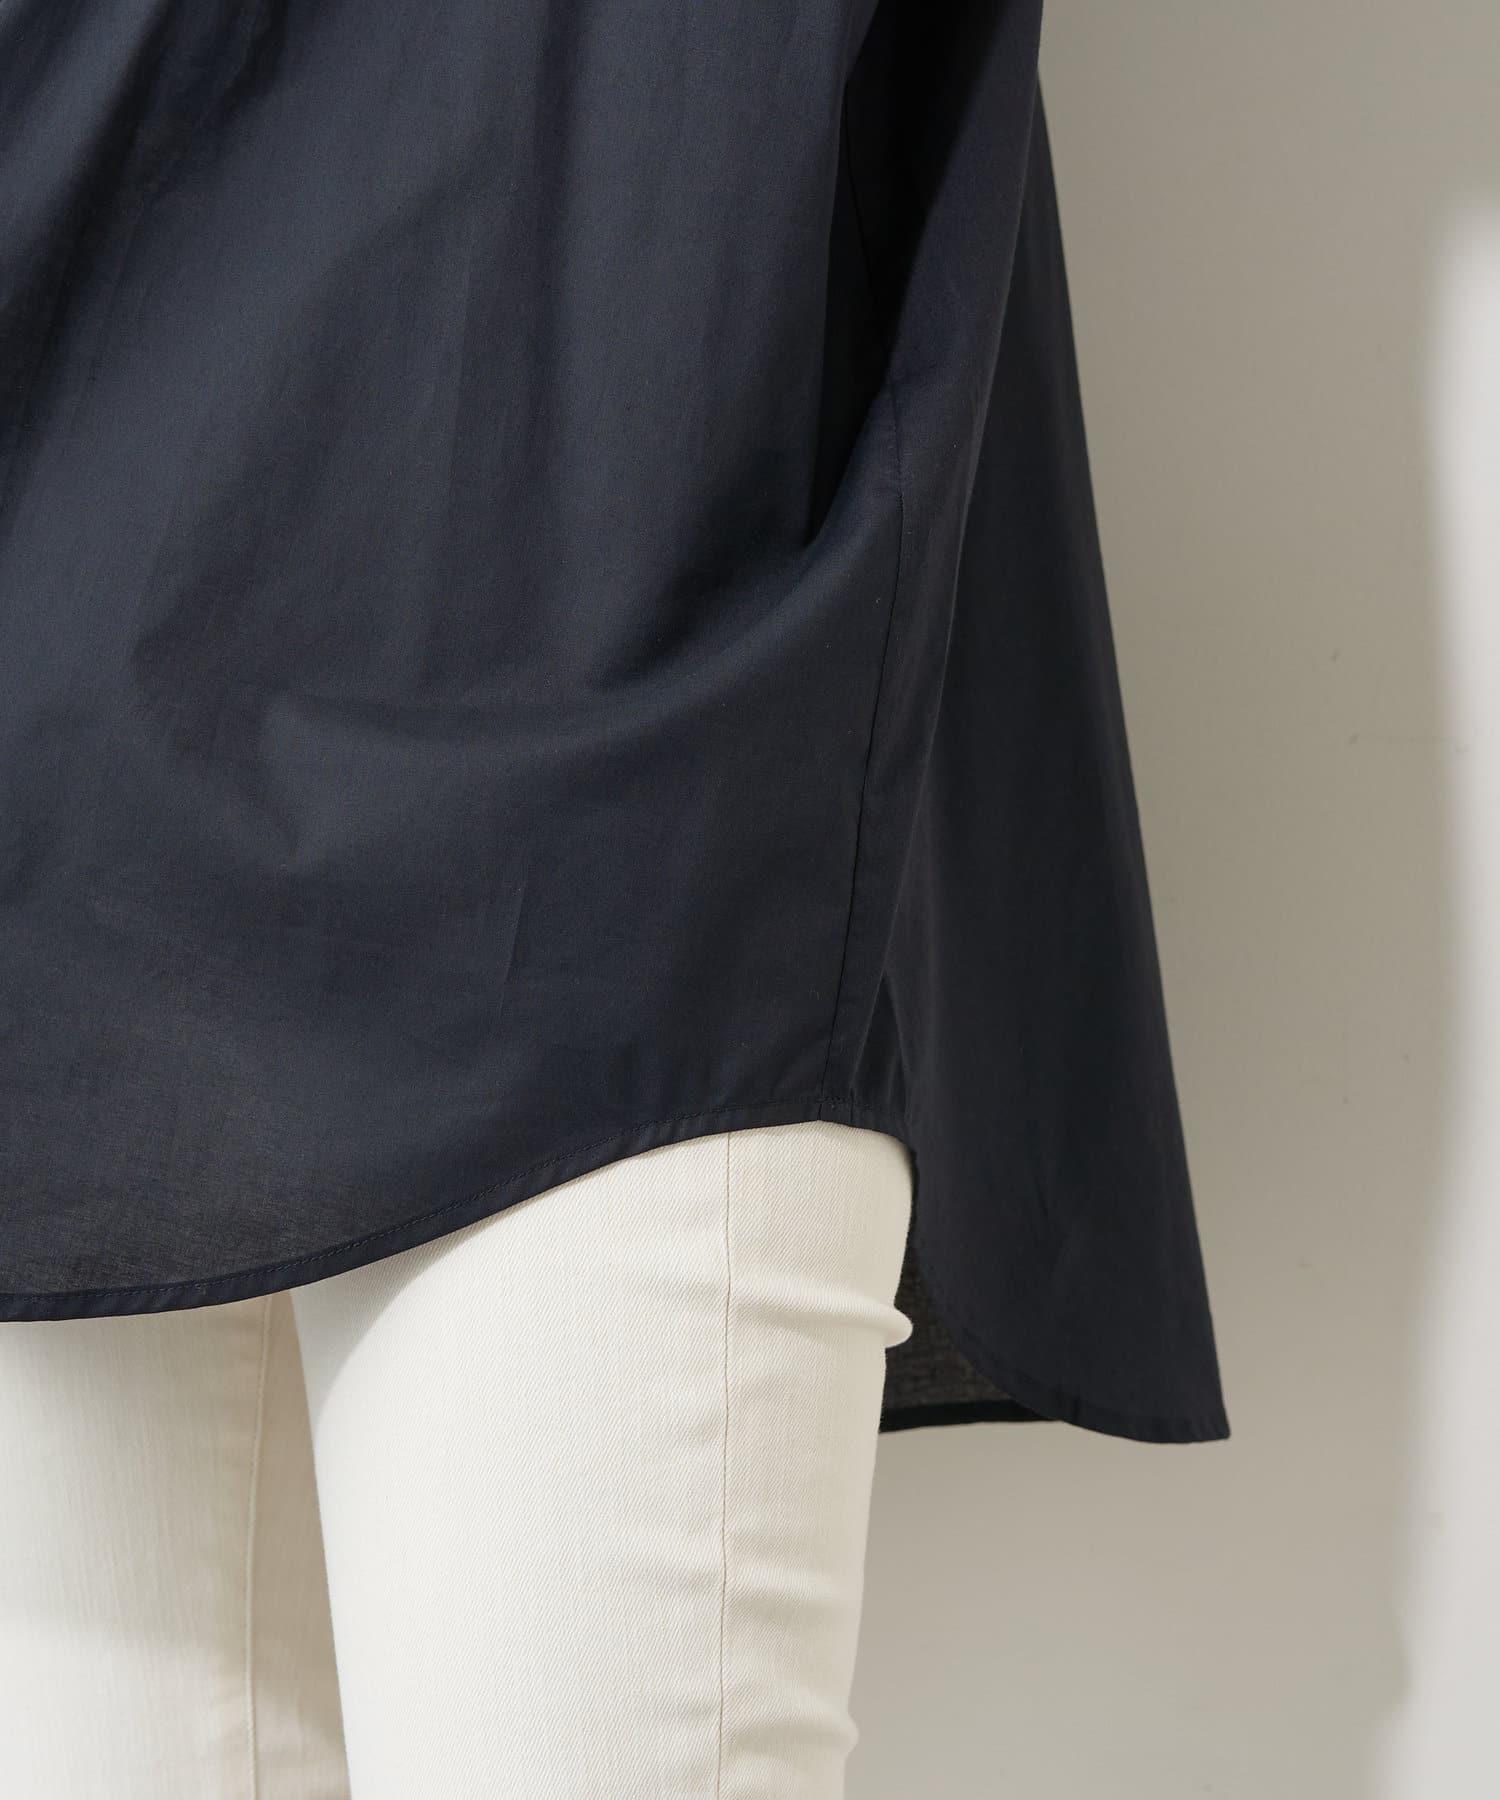 natural couture(ナチュラルクチュール) ヨークピンタック×レースコットンチュニック